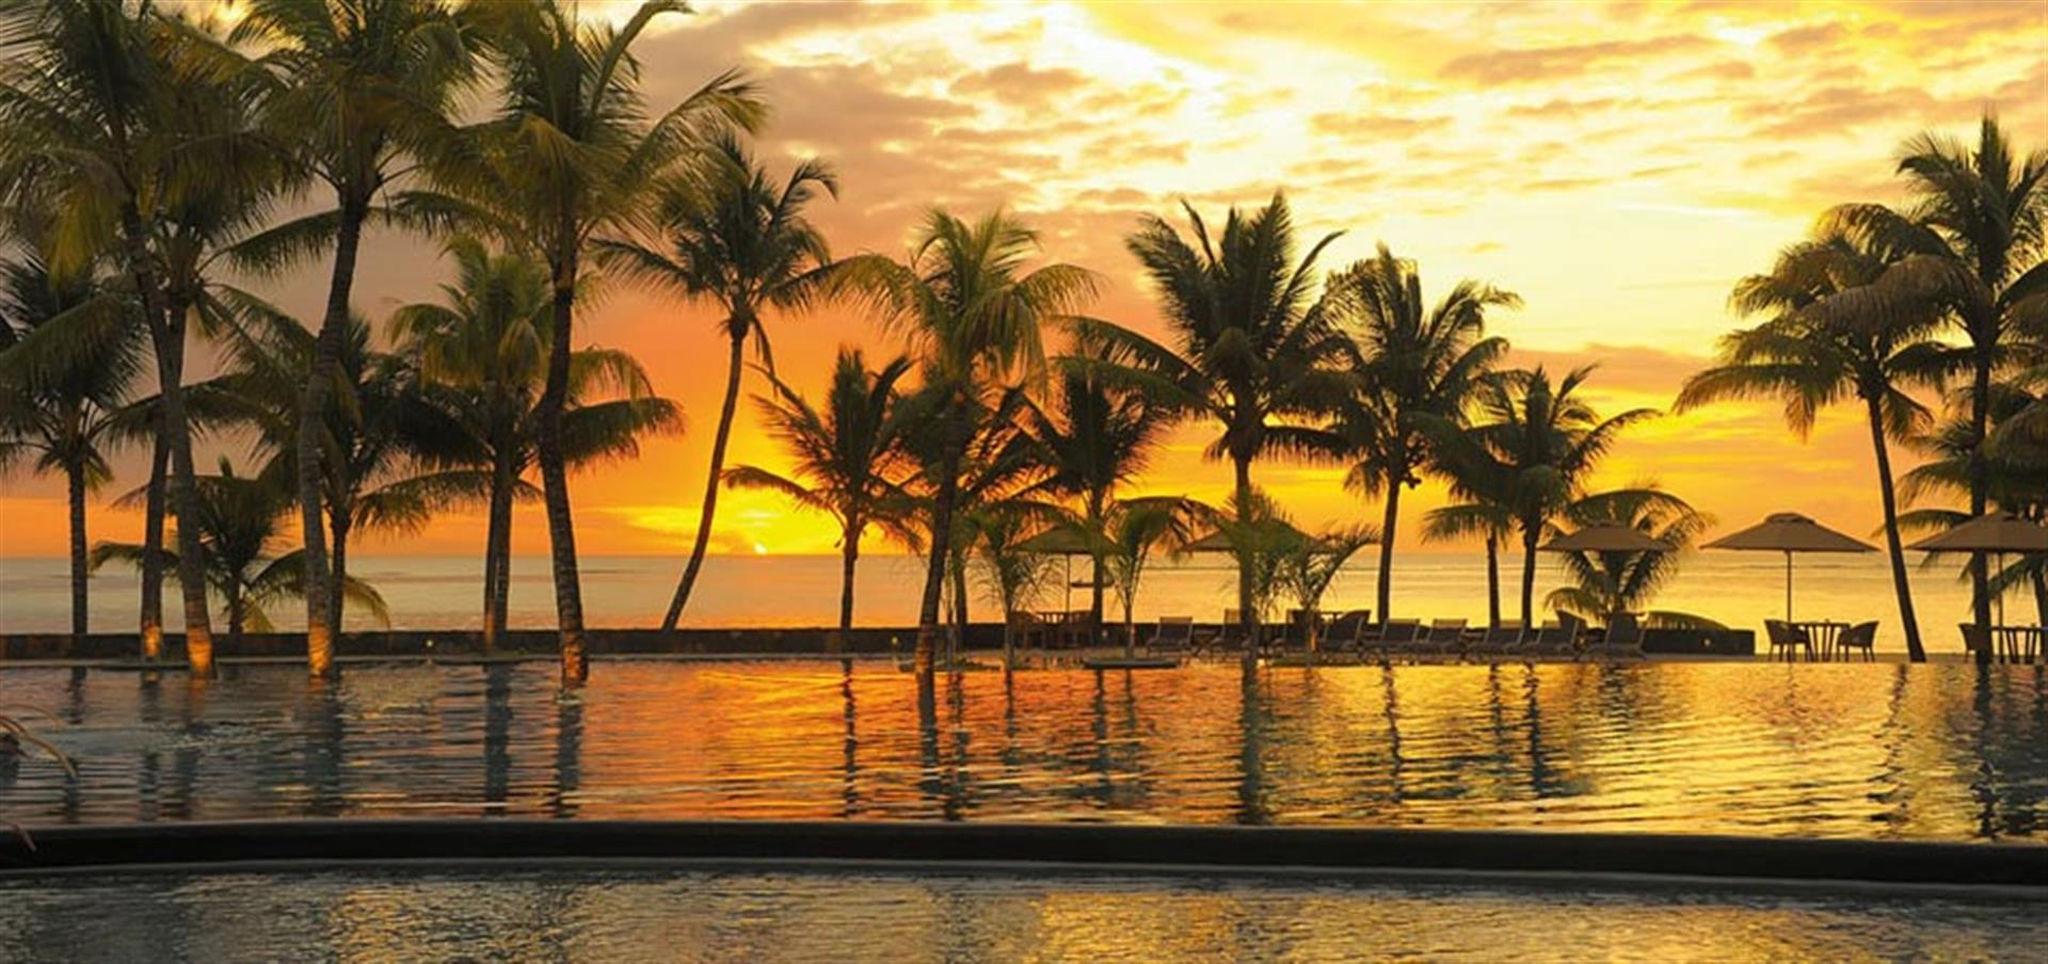 Atardecer de ensueño en Mauricio